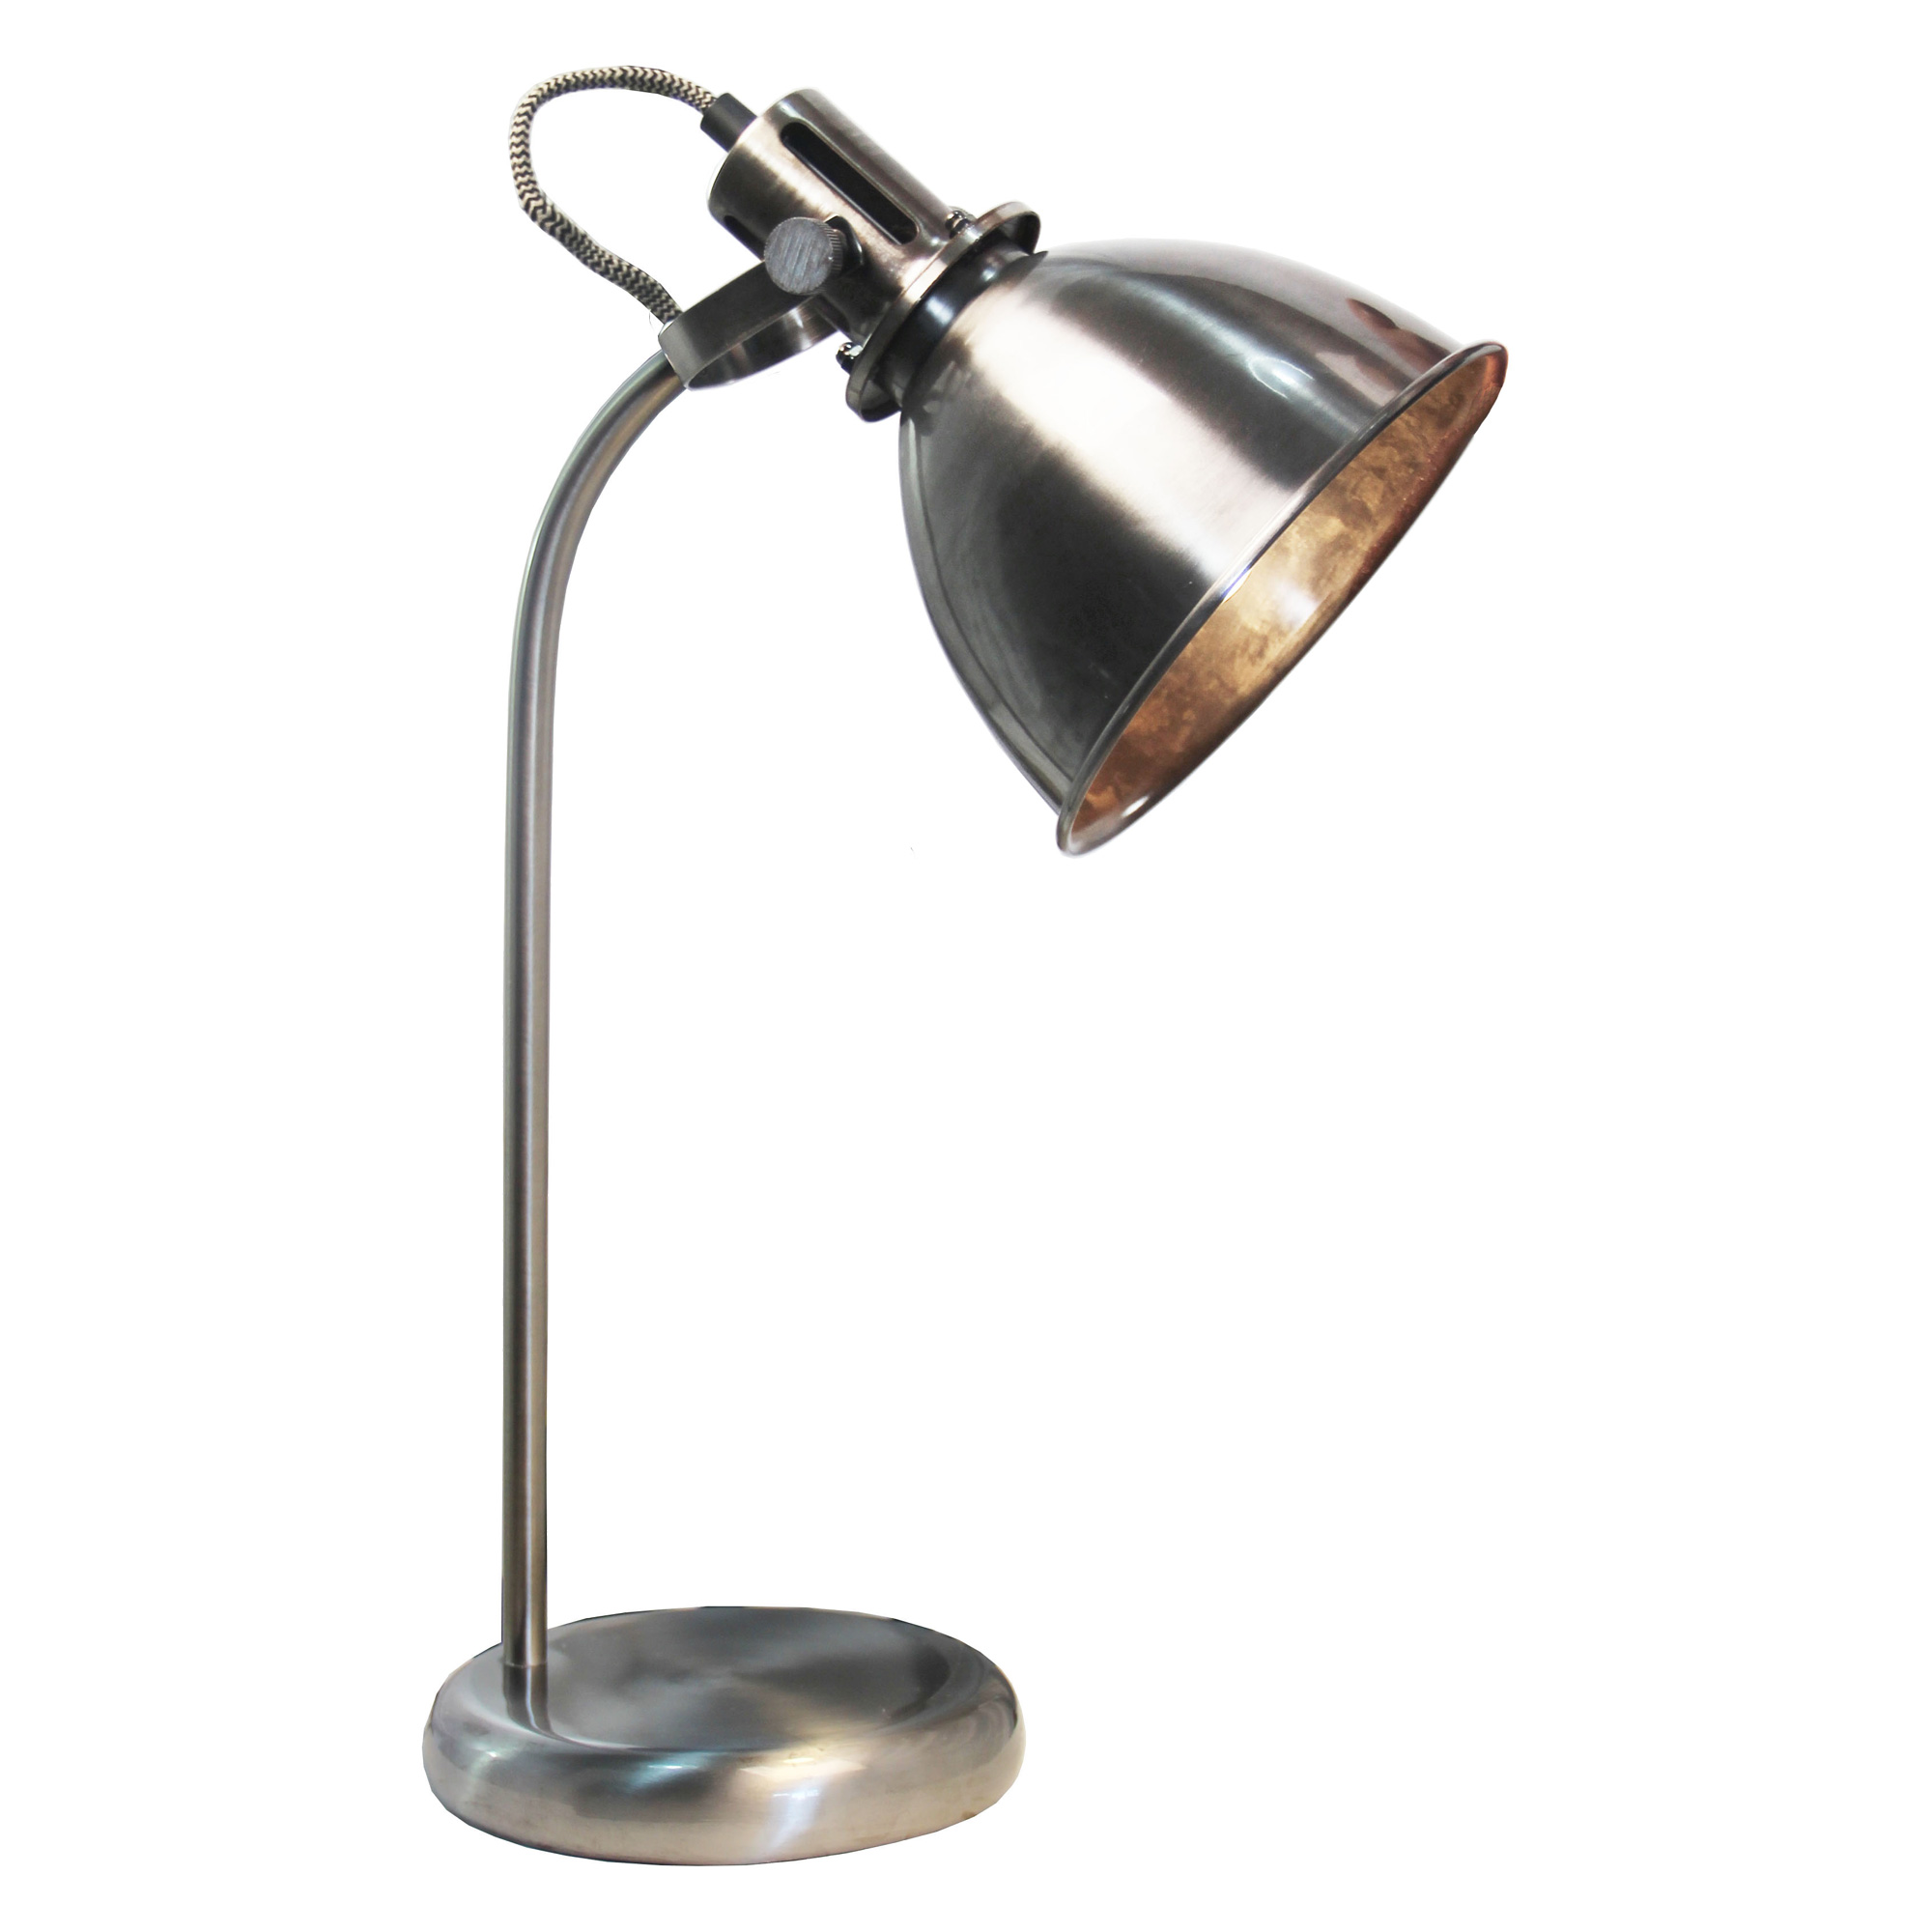 Volta antique silver Leeslamp